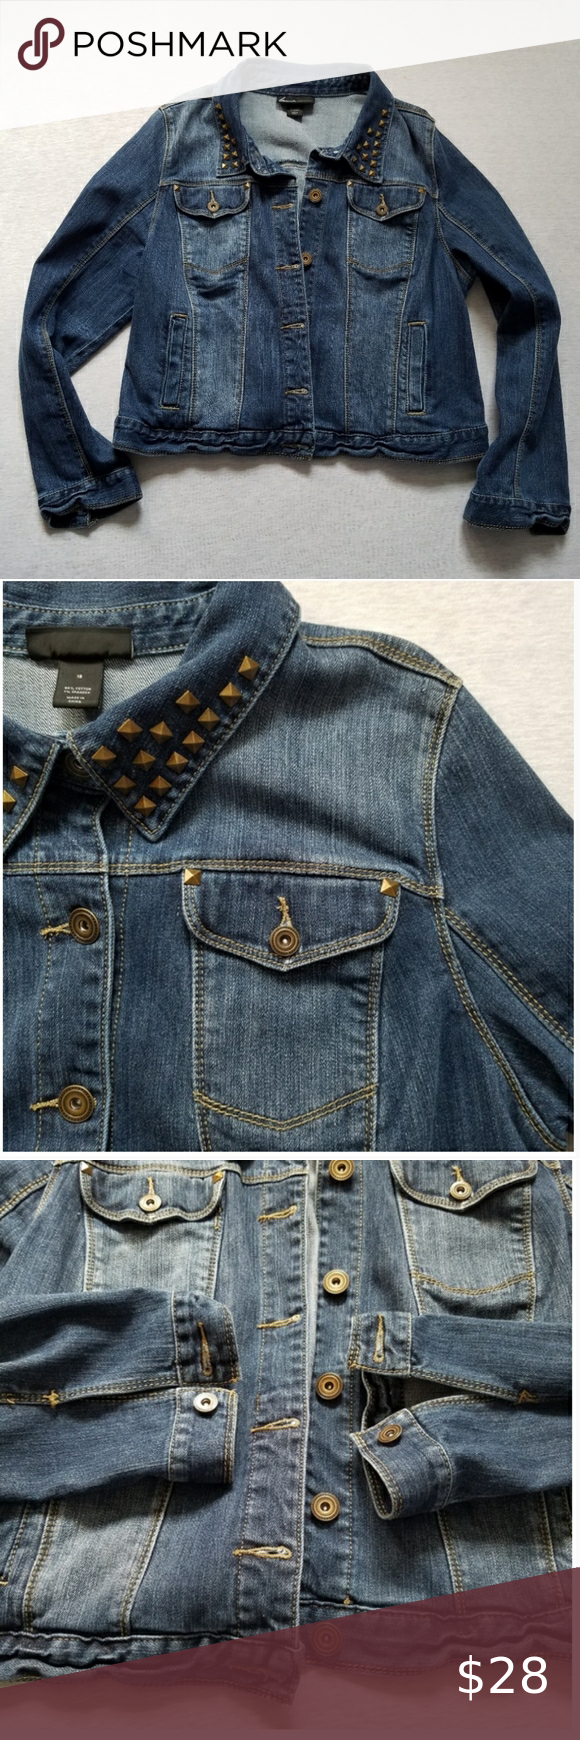 Lane Bryant Jean Jacket Cropped Studs Rivets 18 Jean Jacket Jackets Lane Bryant [ 1740 x 580 Pixel ]